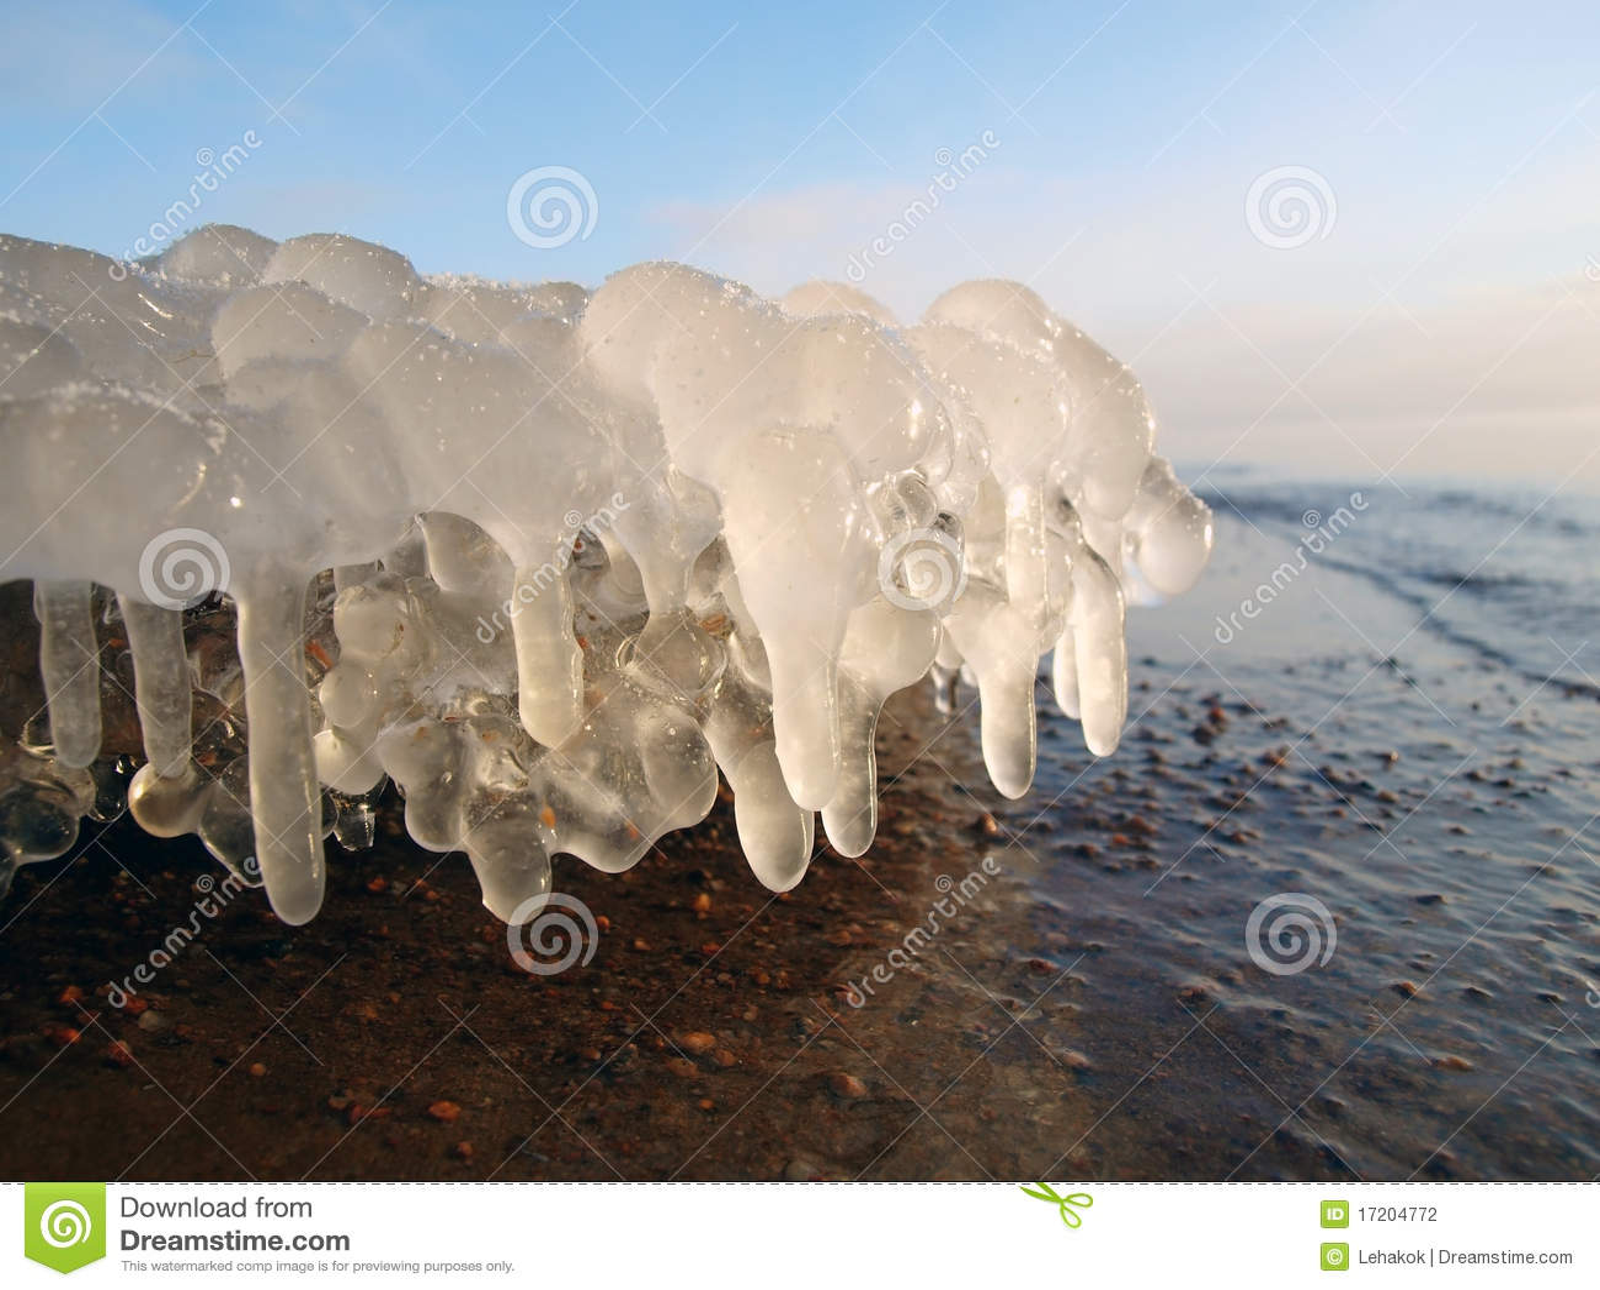 Ice stalactites